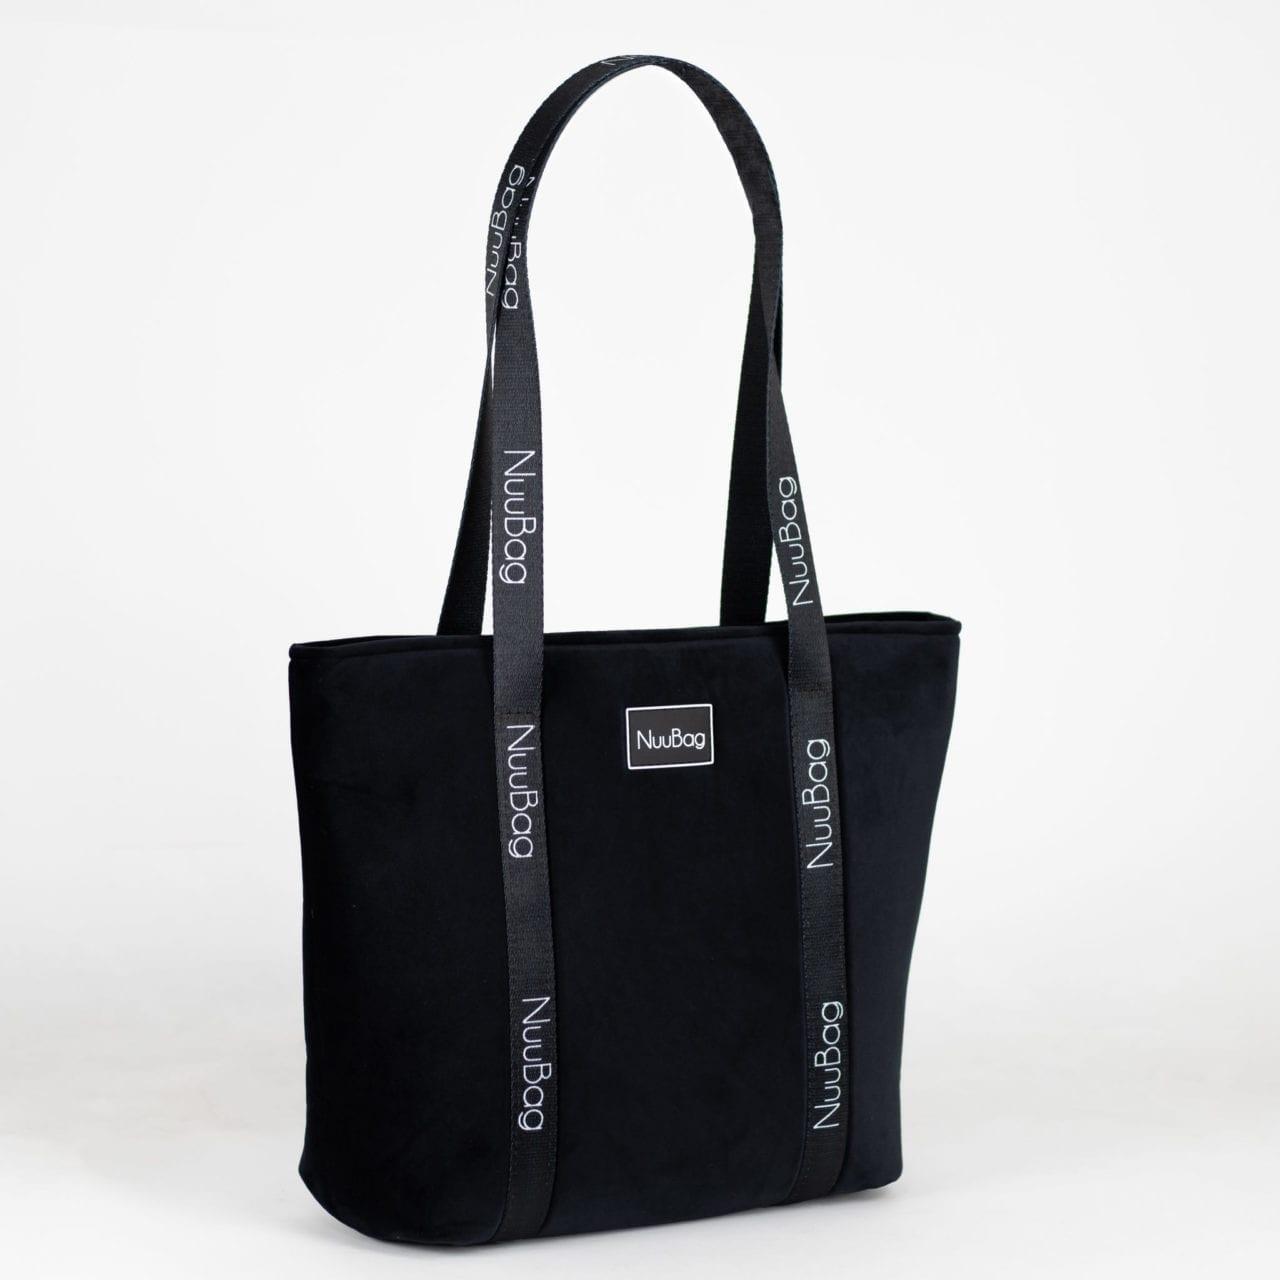 Czarna torba na zakupy, torebka shopperka